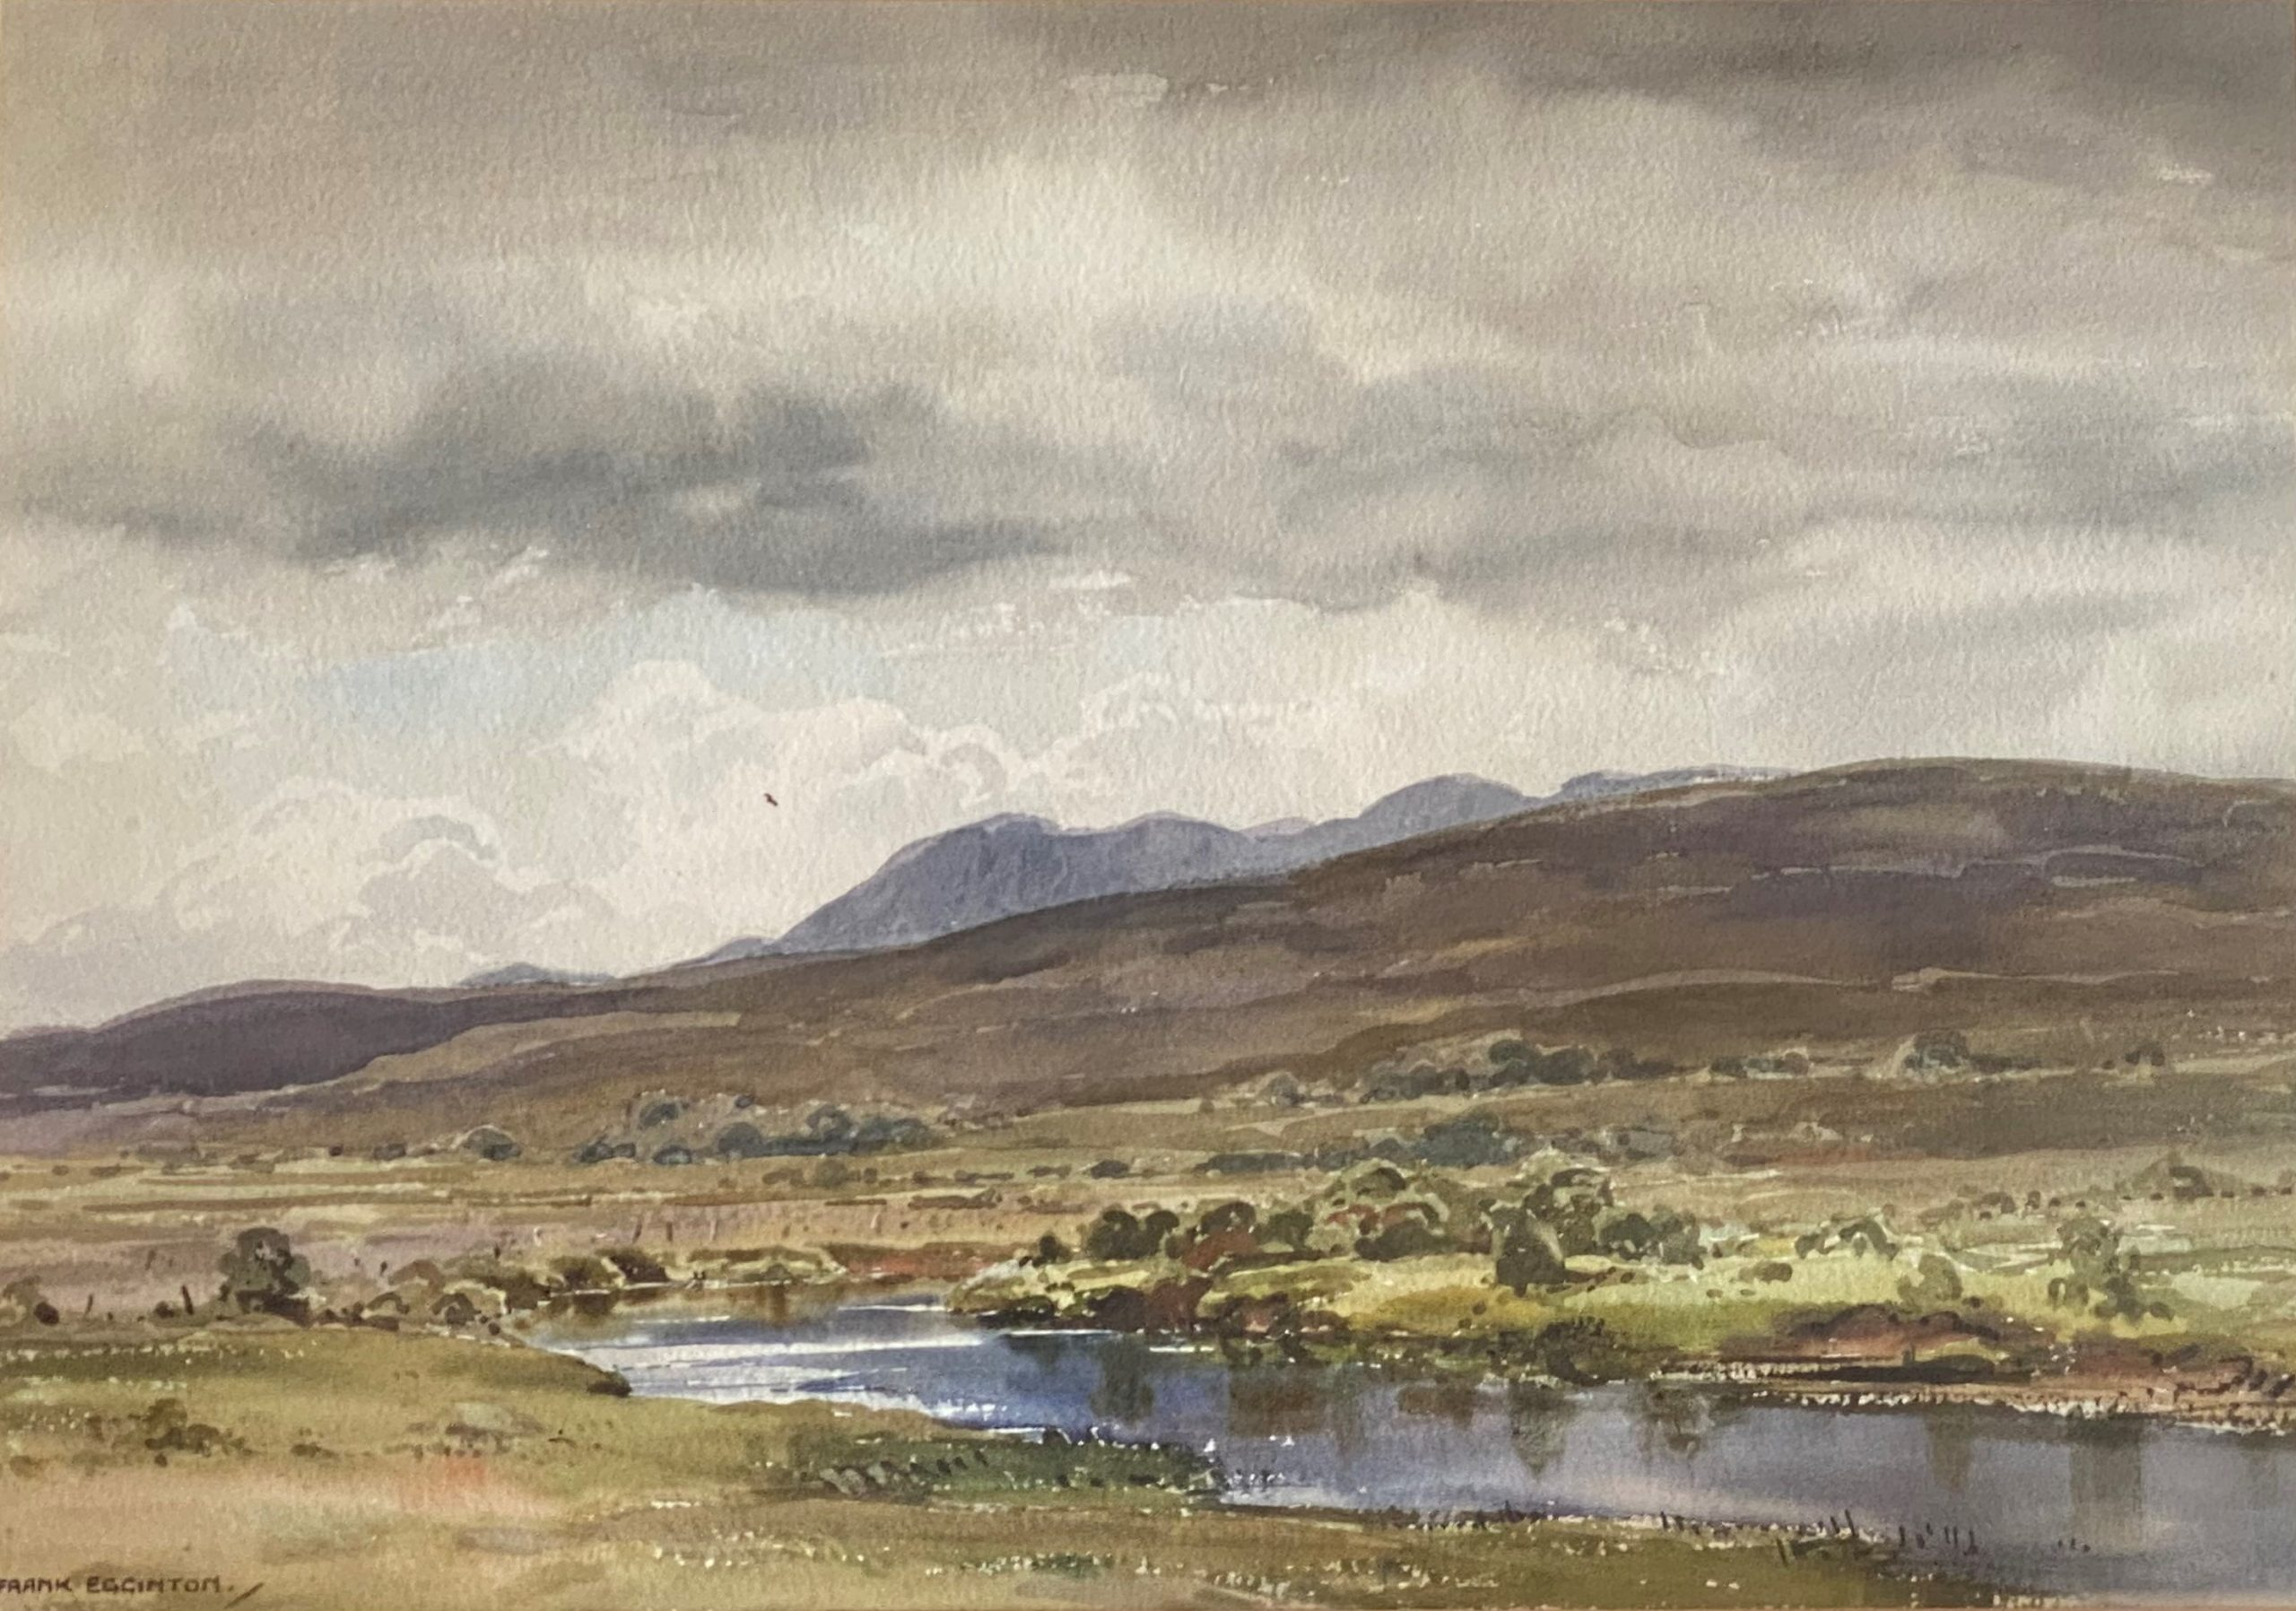 Frank Eggington Mountain landscape